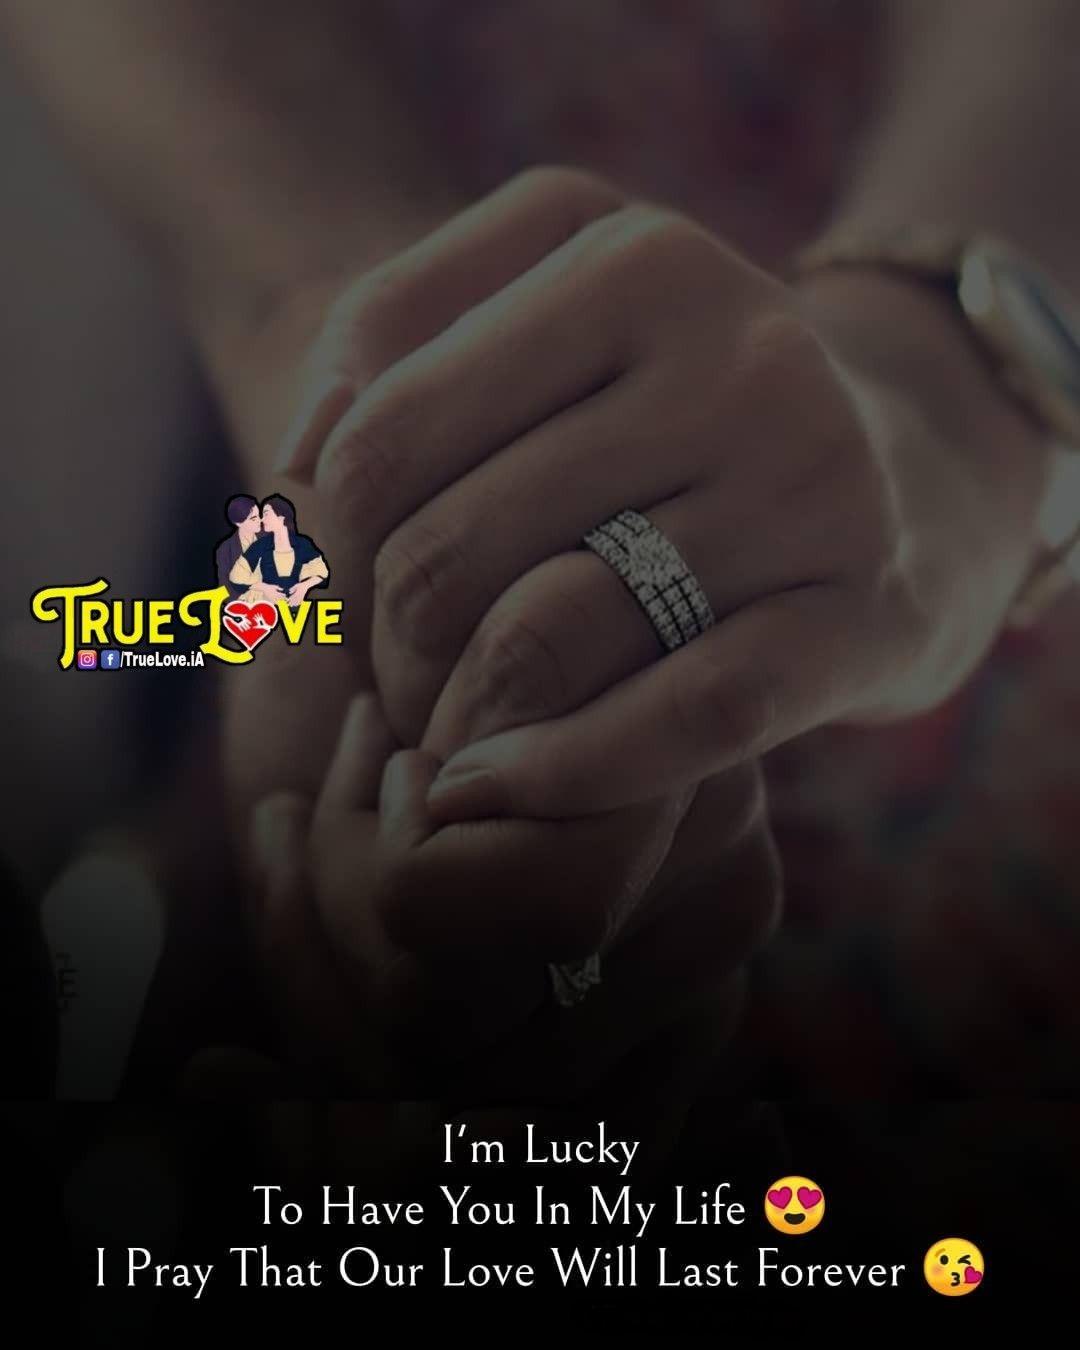 TrueLove, Truelove.xd, Truelove.ia, truelove, truelove xd, truelove ia, #TrueLoveiA #TrueLove #TrueLovexD